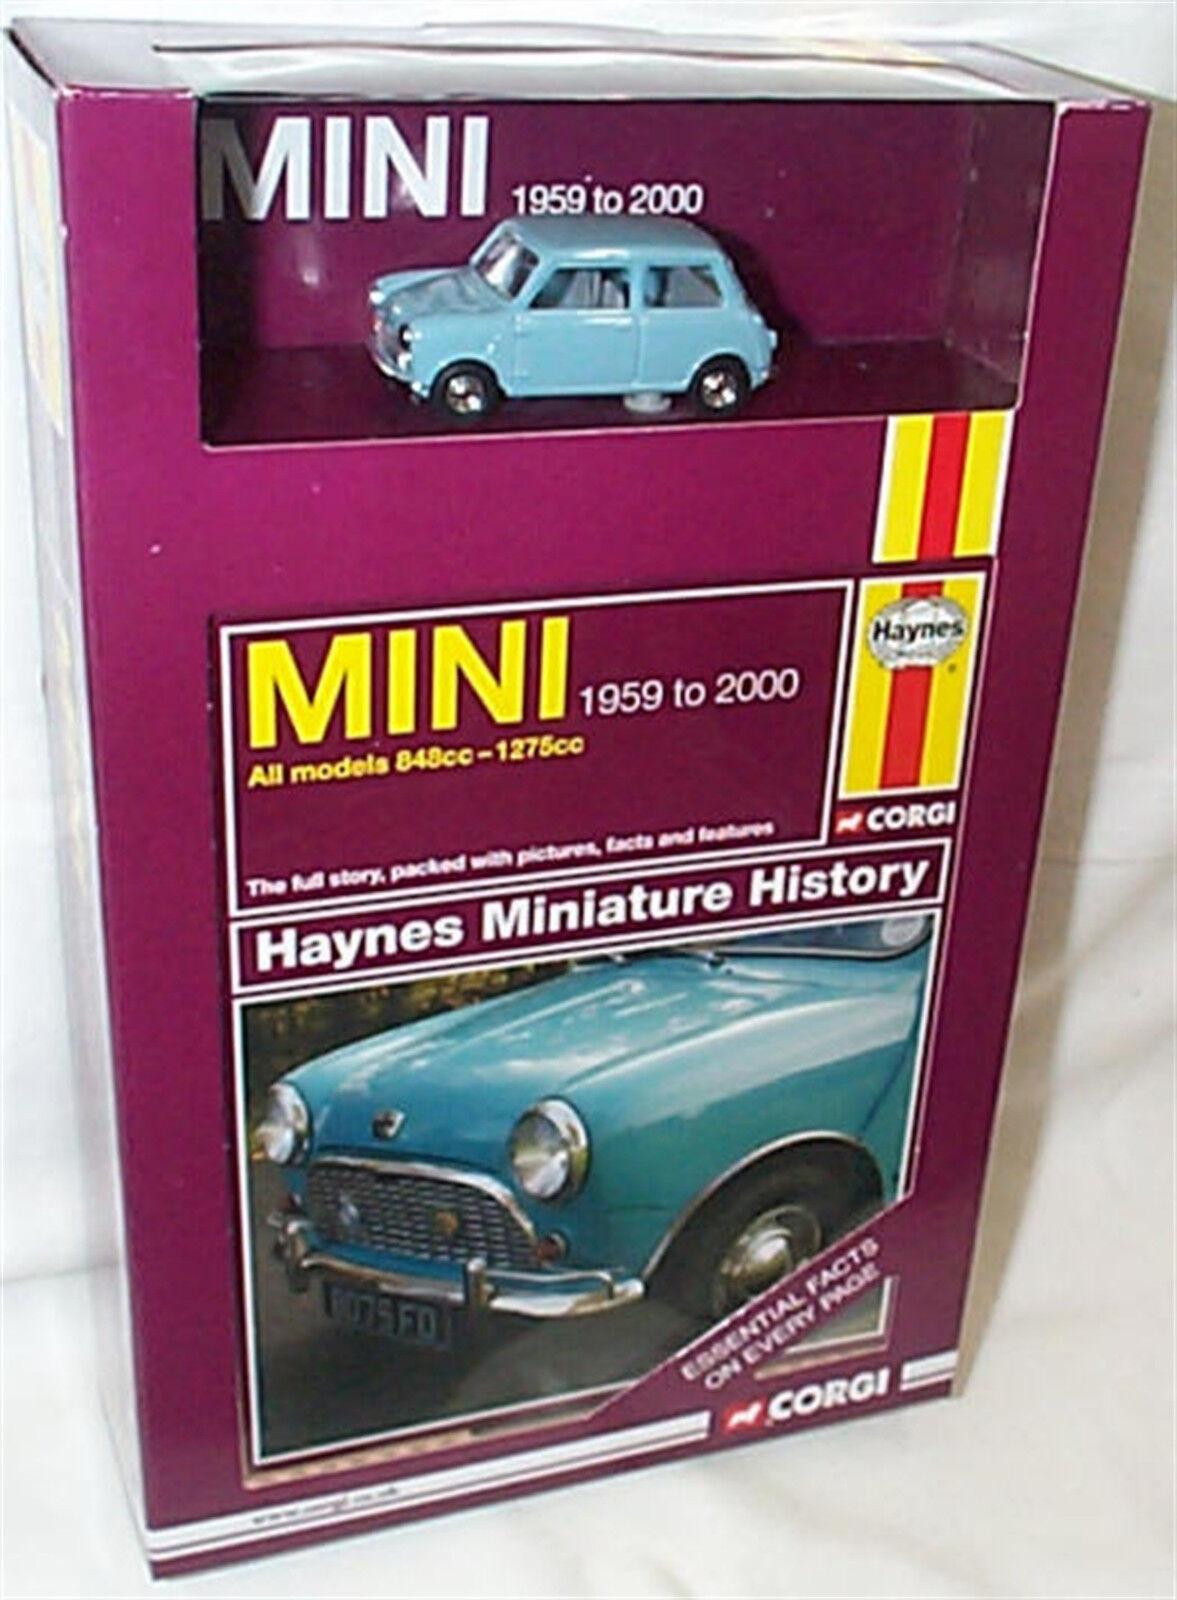 Mini bluee 1959-2000 1-43 scale Haynes mini History Book & Car Boxed set CC03001